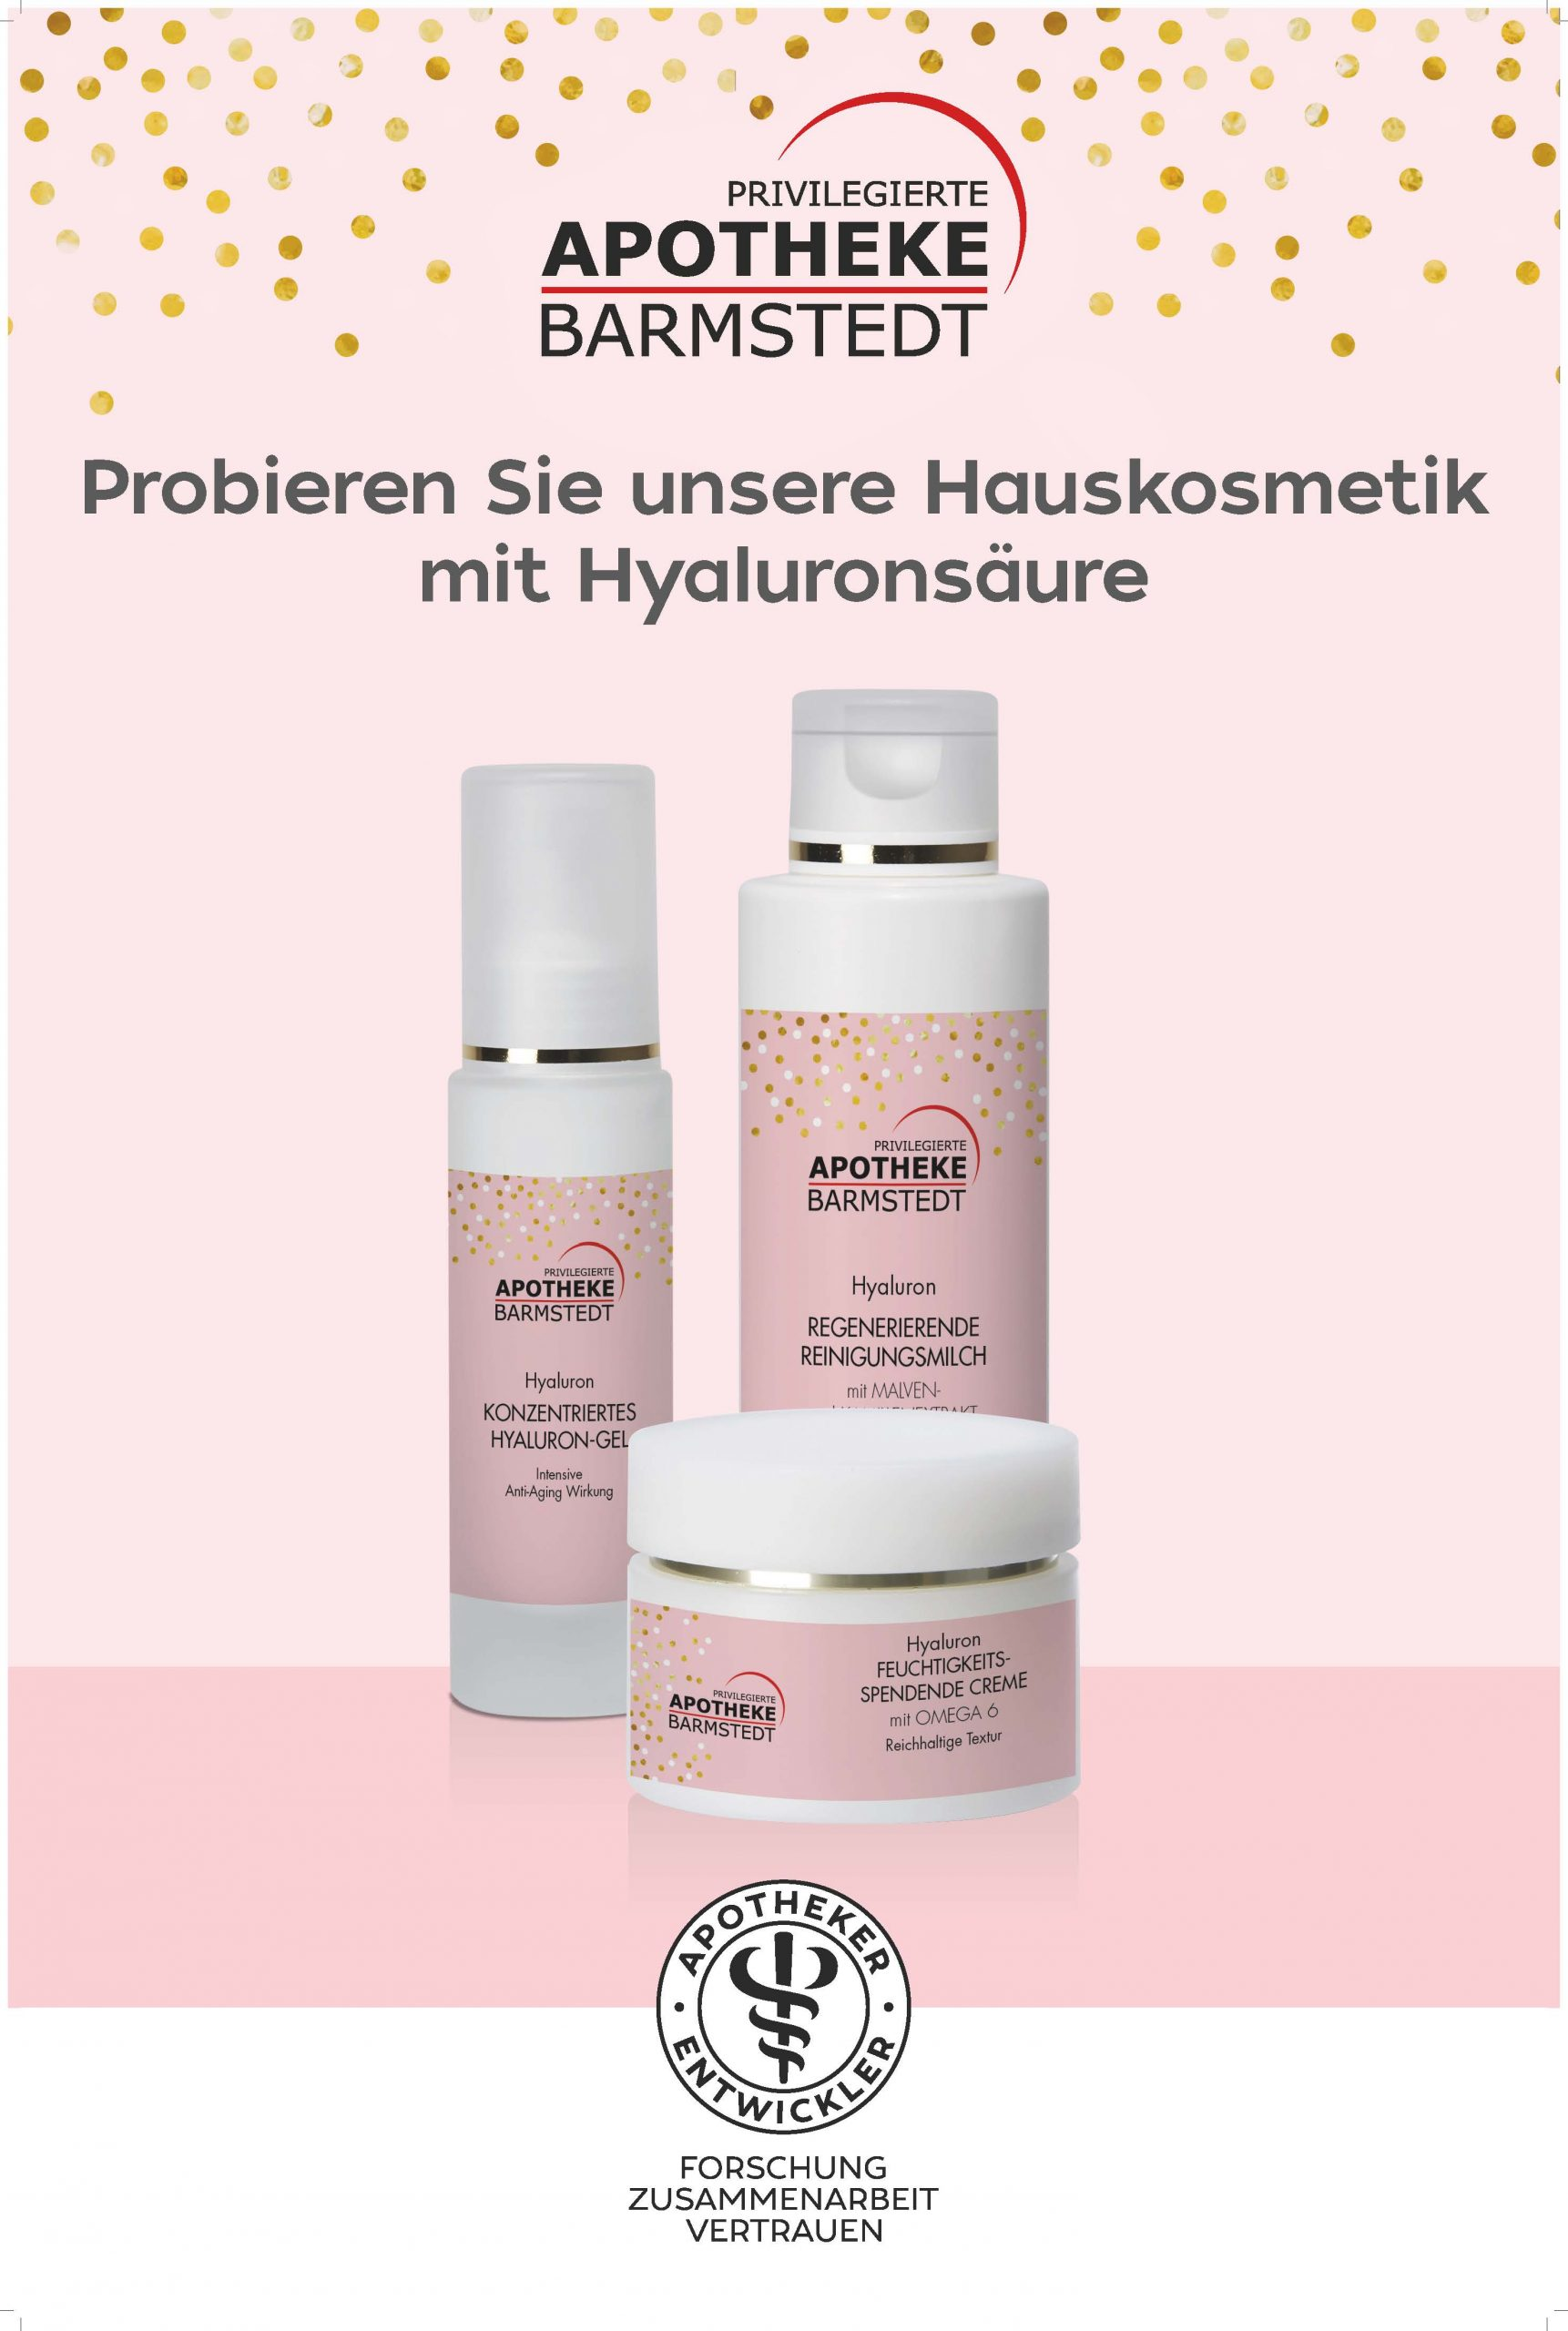 Privilegierte_apotheke_barmstedt_beauty_kosmetik_header